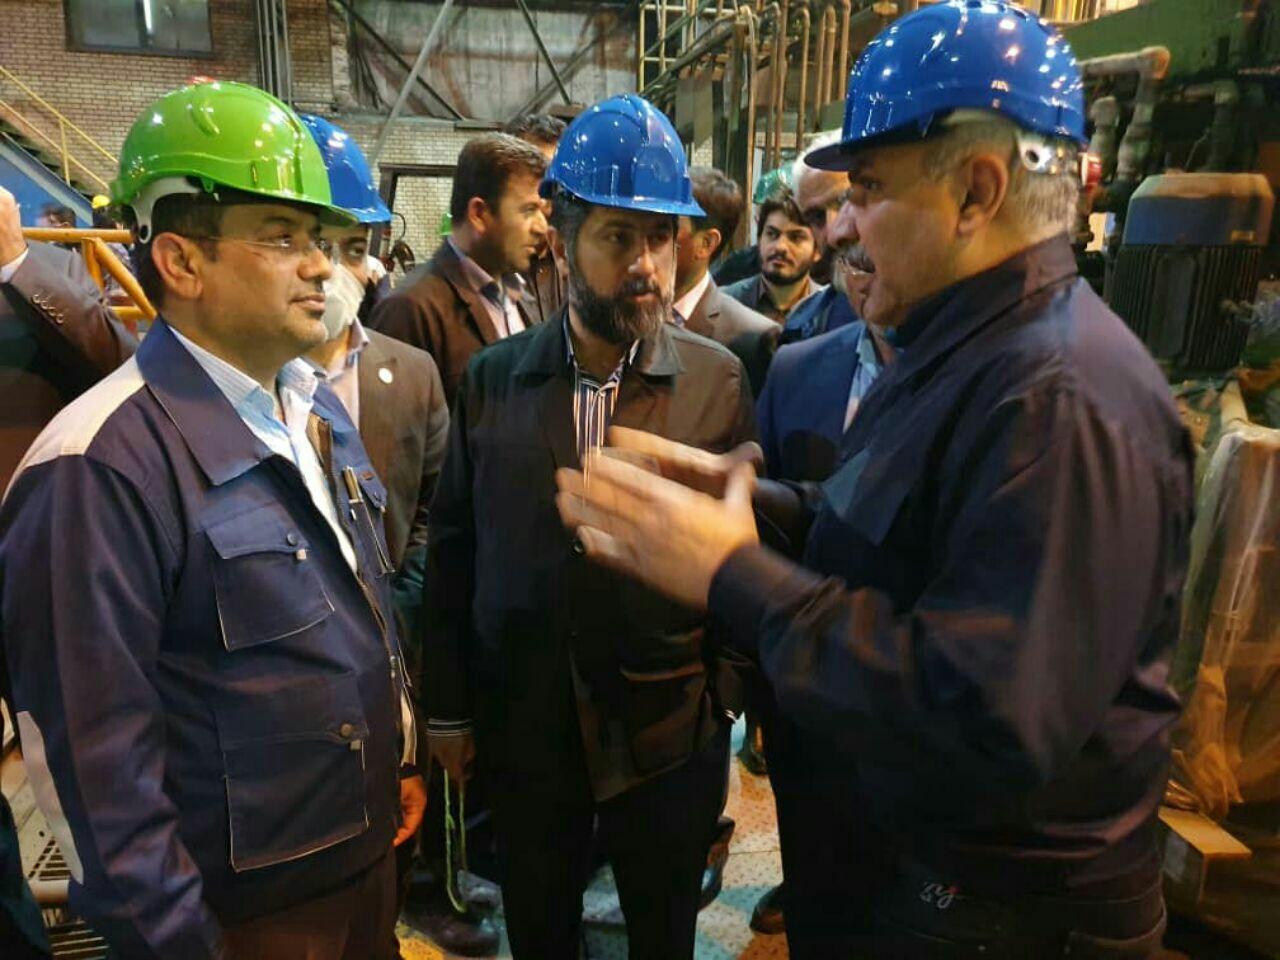 IMG 20200502 052524 605 شرکت لولهسازی اهواز در سال جهش تولید ظرفیت همکاری با صنایع را افزایش داد